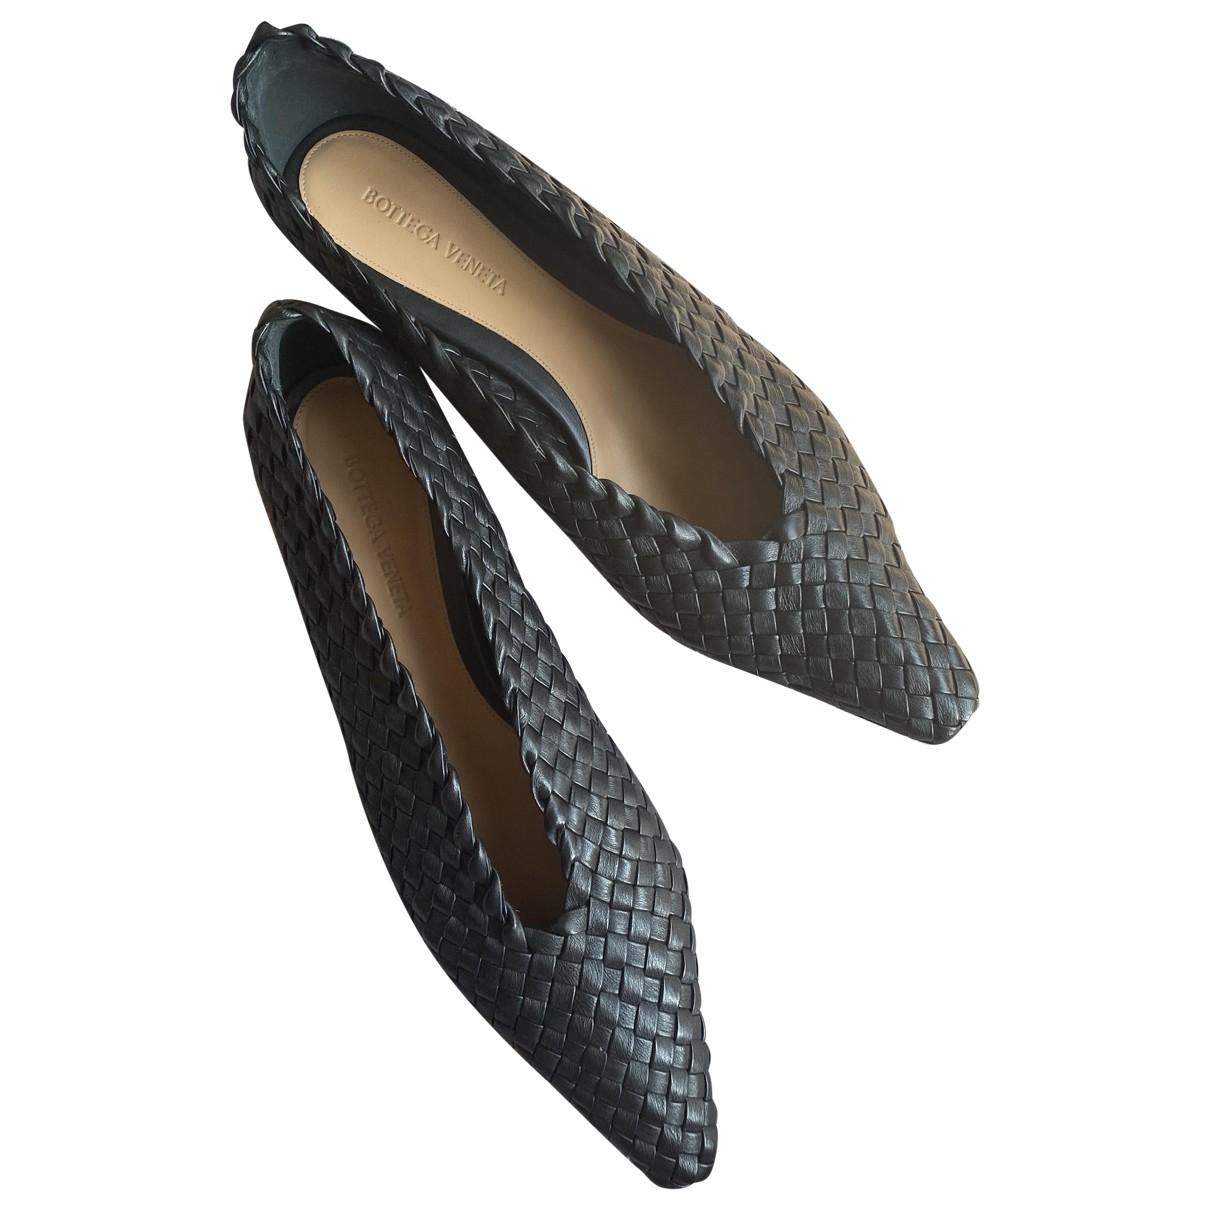 Bottega Veneta - Ballerines   pour femme en cuir - noir